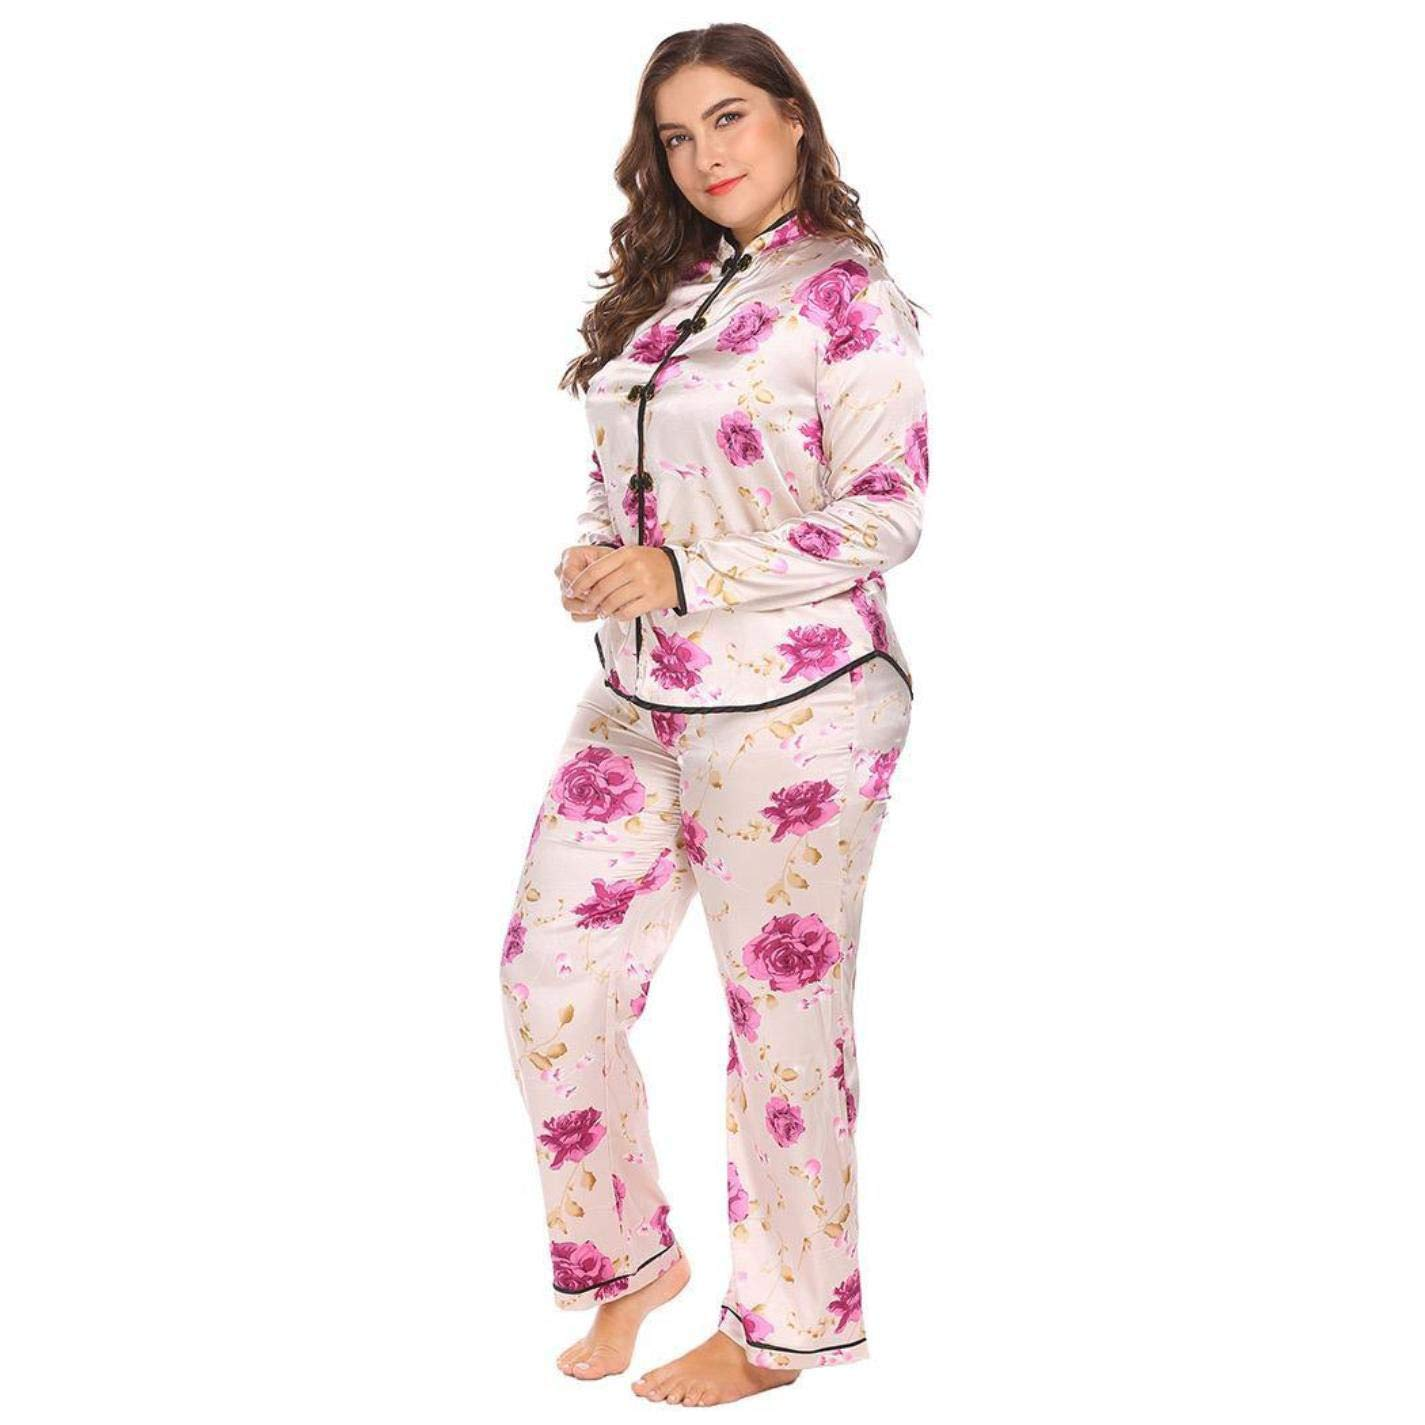 cf3974278c Amazon.com  Women Satin Plus Size Stand Color Long Sleeve Floral Top Pants  Pajama Set  Clothing